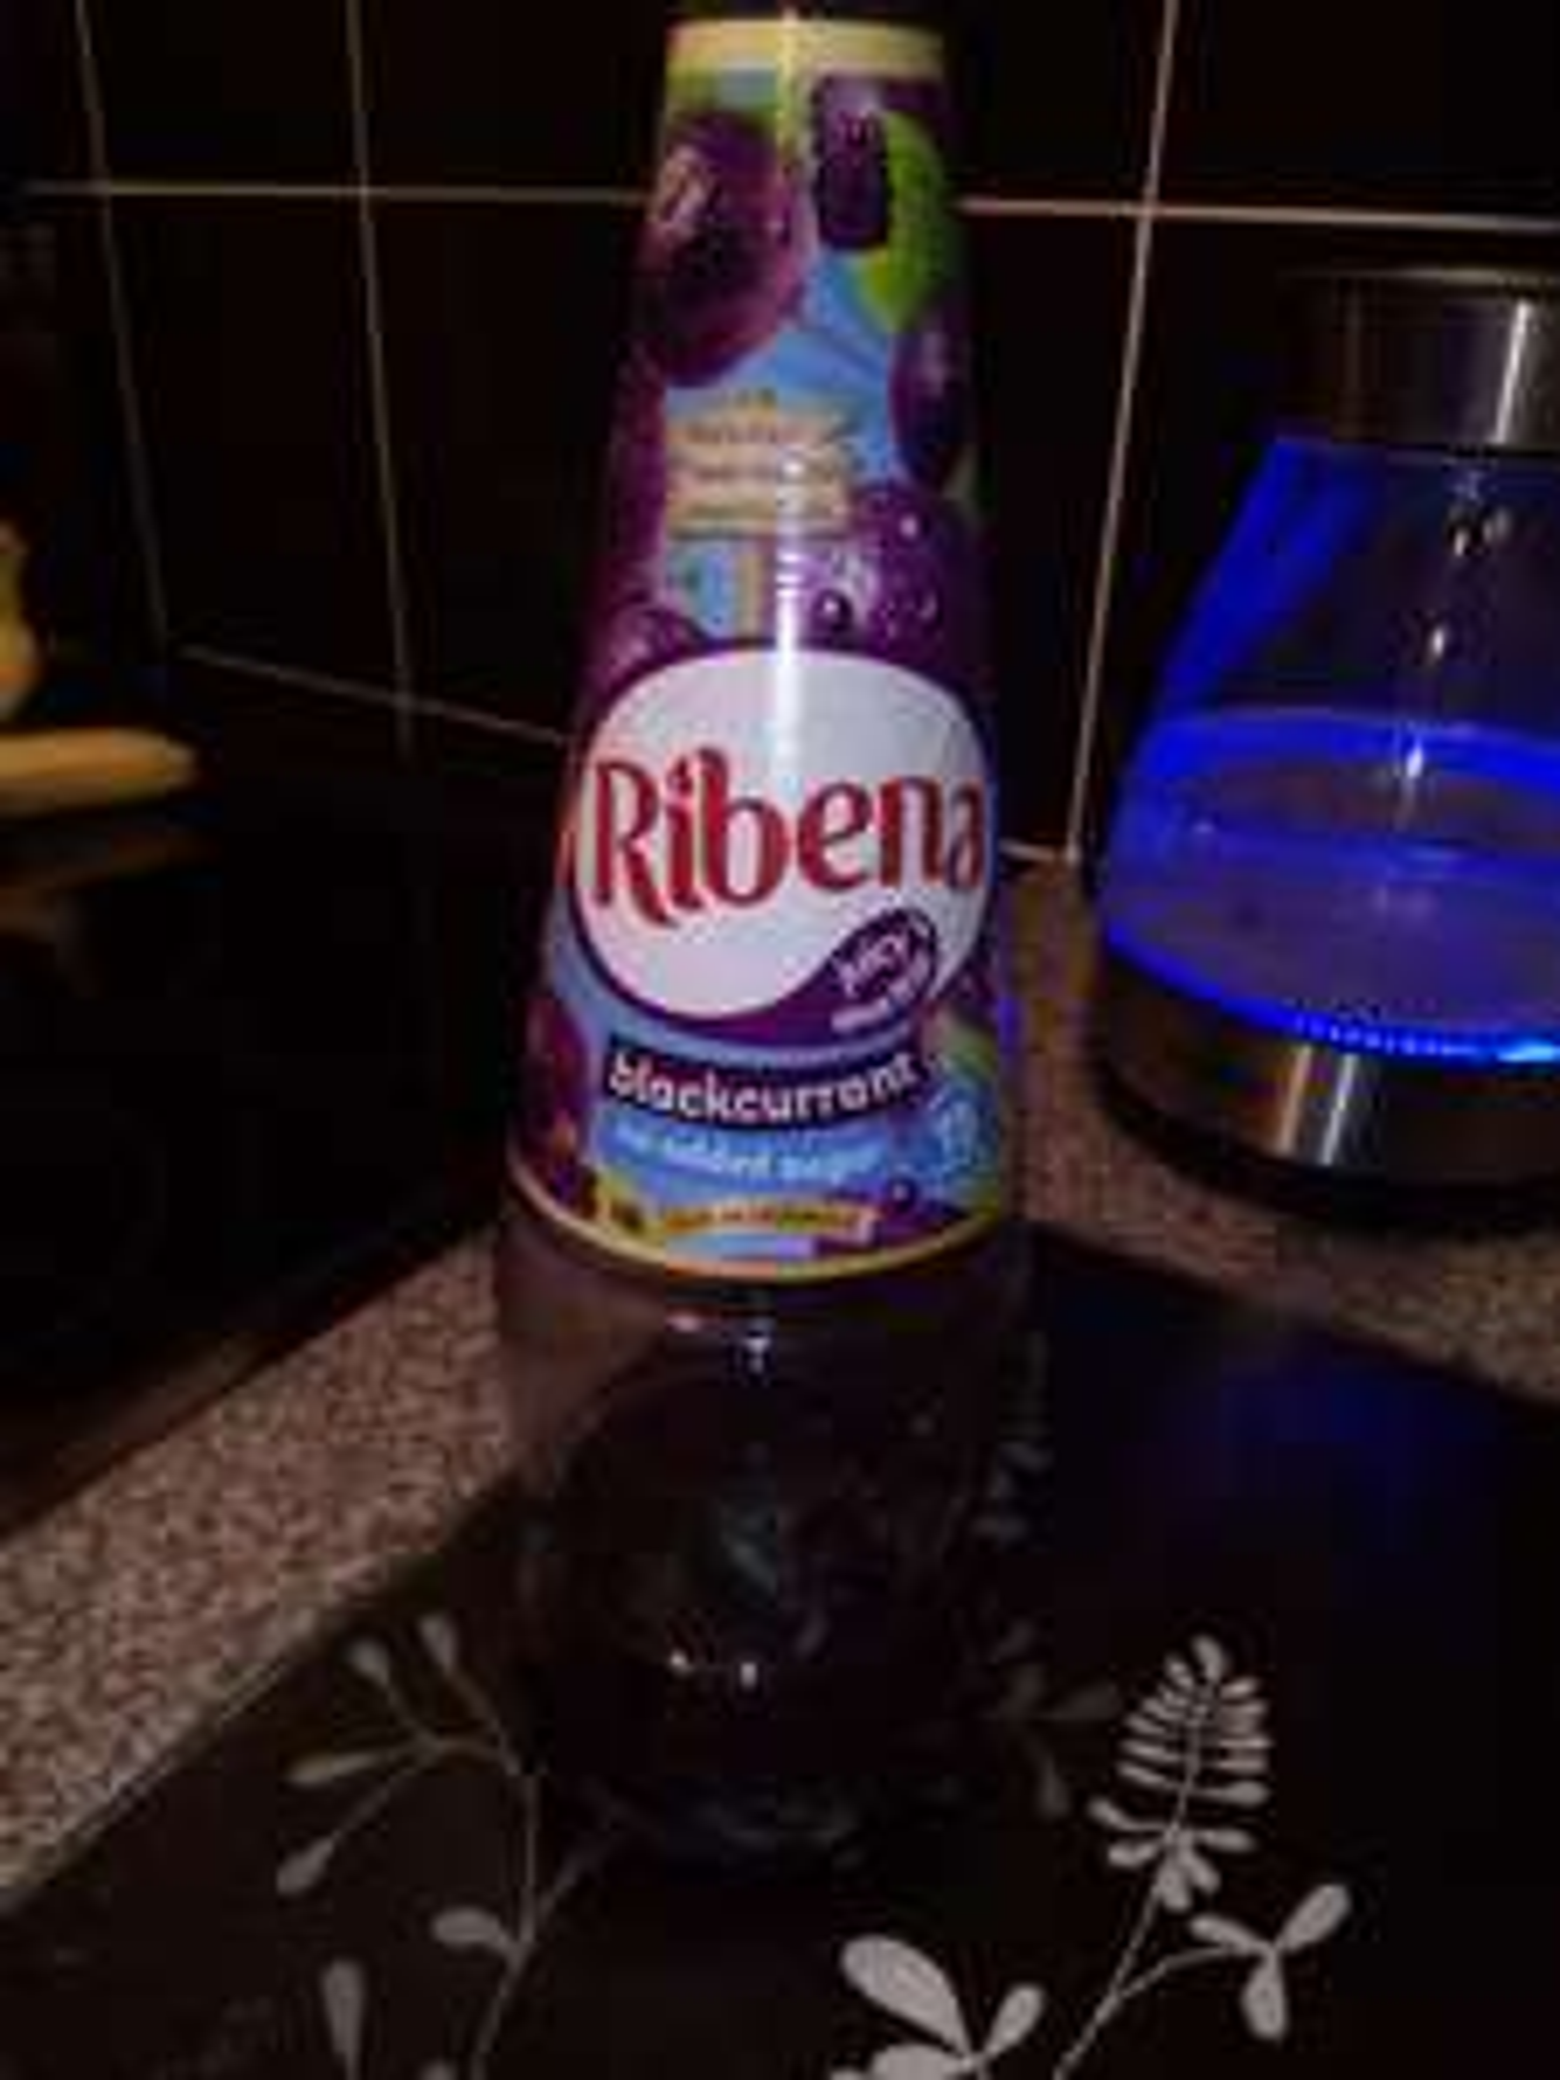 Ribena no added sugar 850ml £1 instore @ Iceland (Bristol)